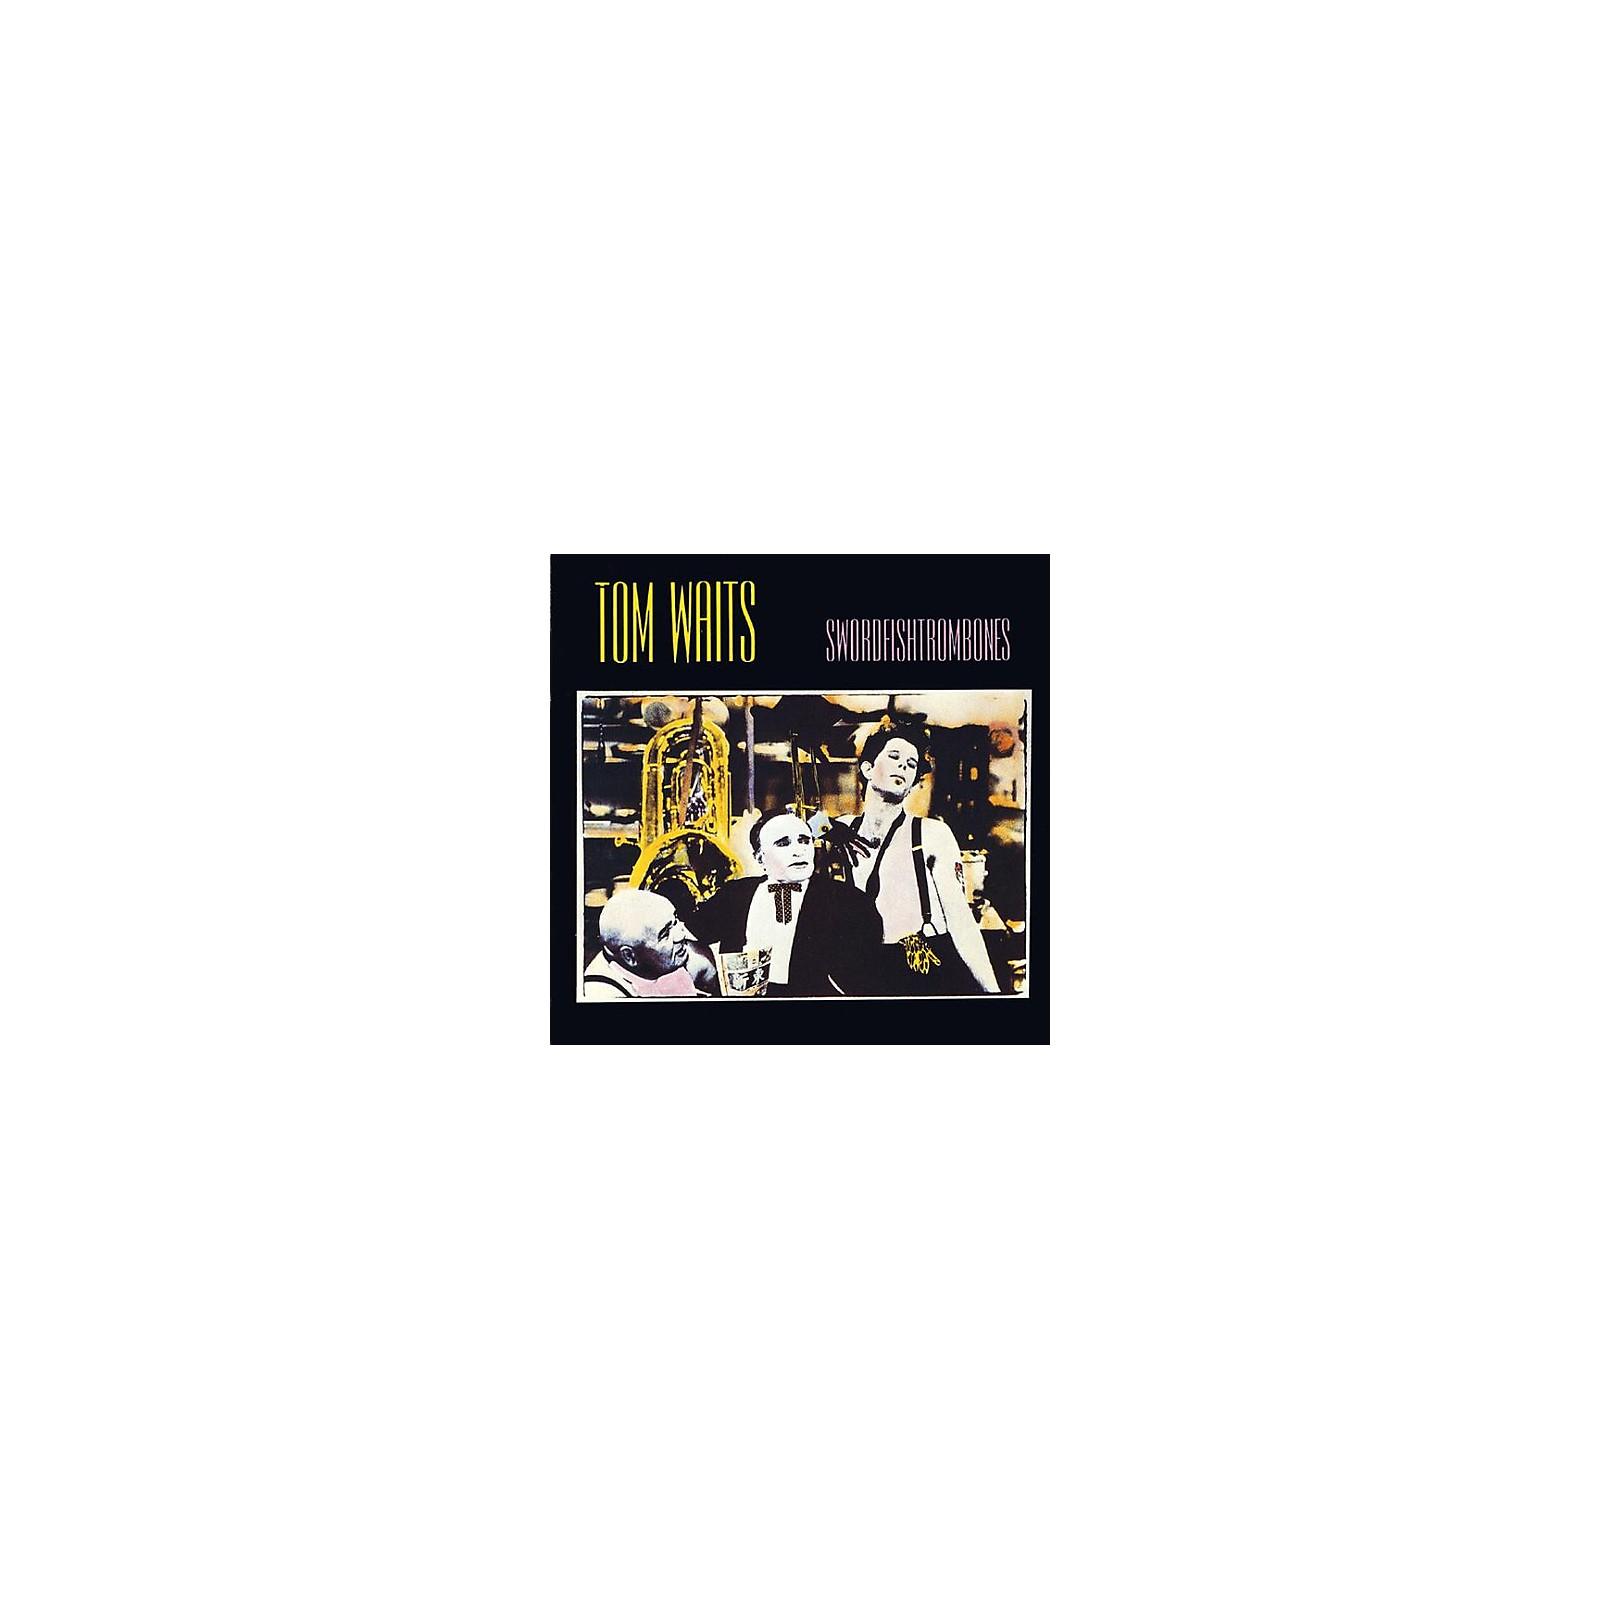 Alliance Tom Waits - Swordfishtrombones [Special Edition] [Reissue]